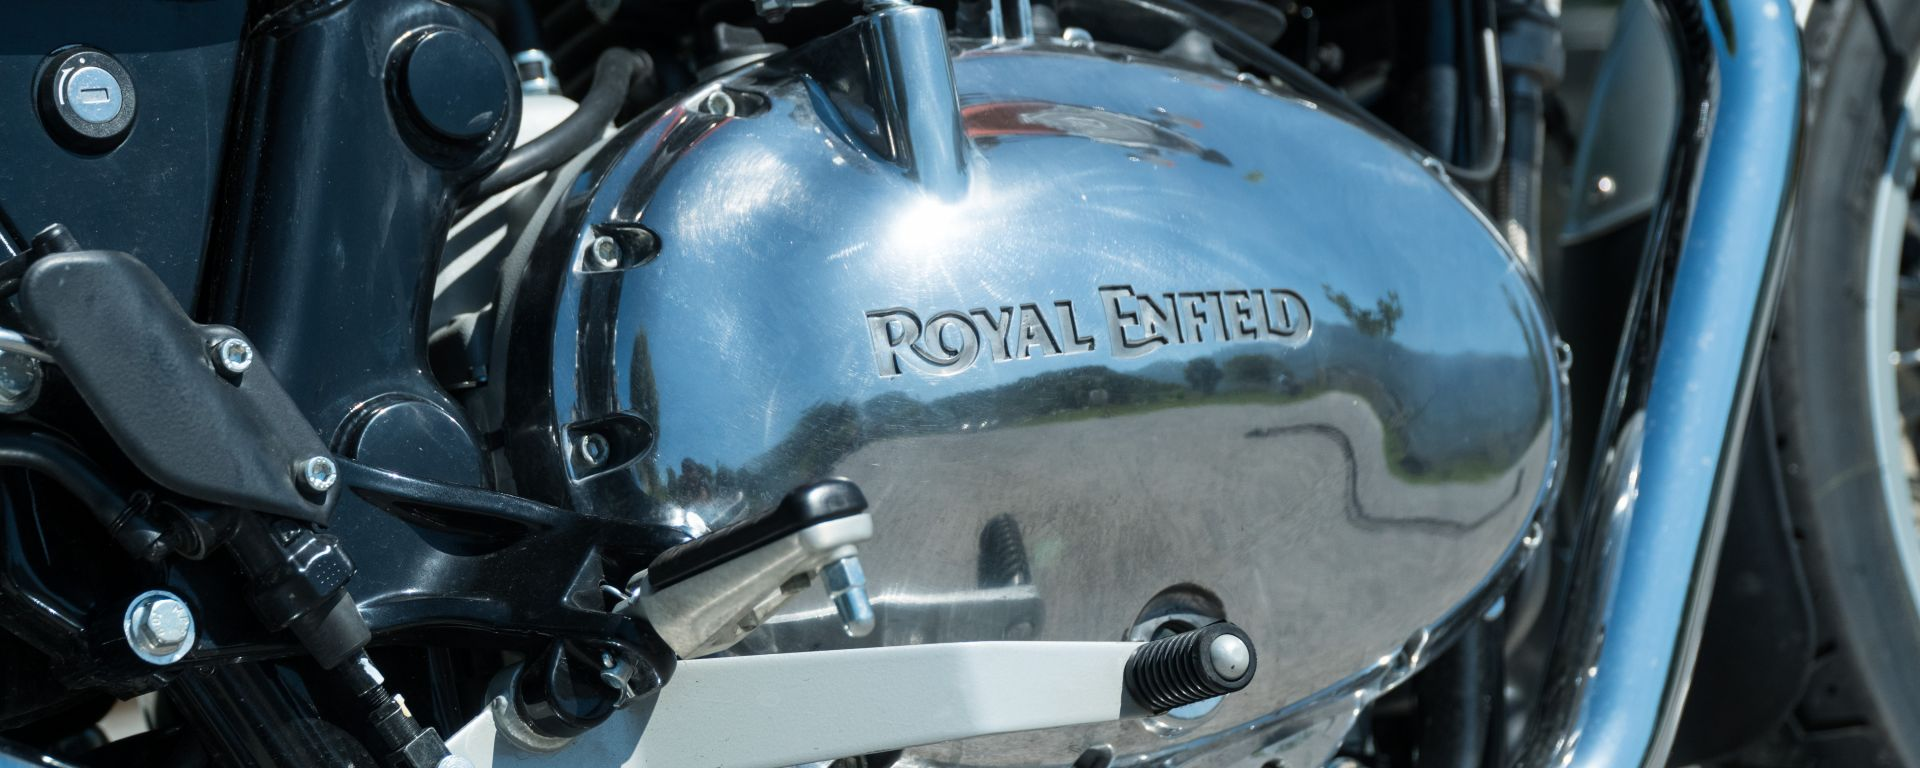 Royal Enfield Interceptor 650: piacciono i carter cromati